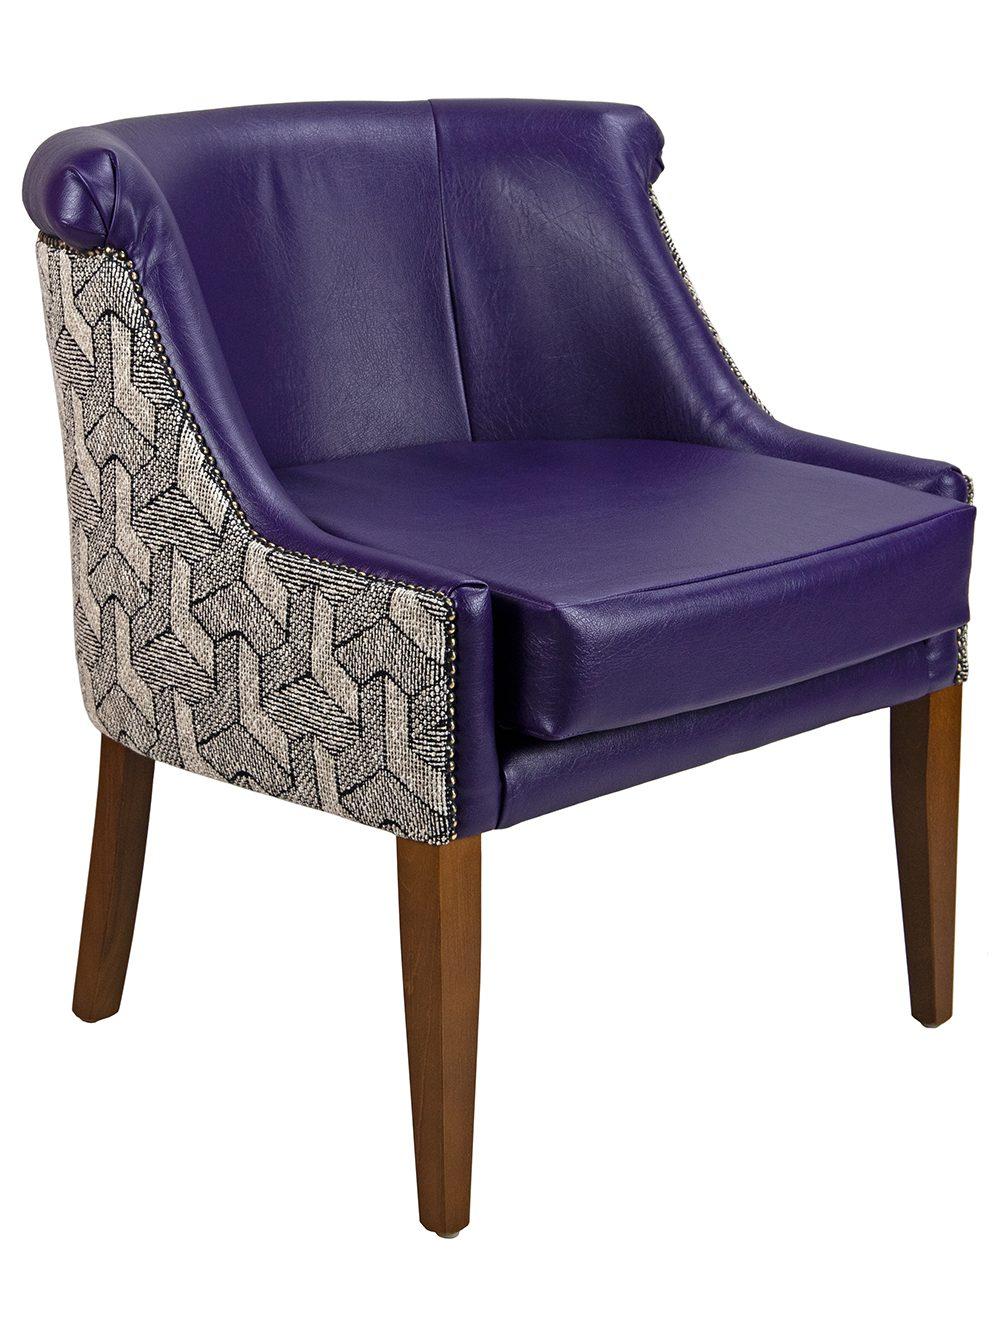 PurpleWhite-45-WEB